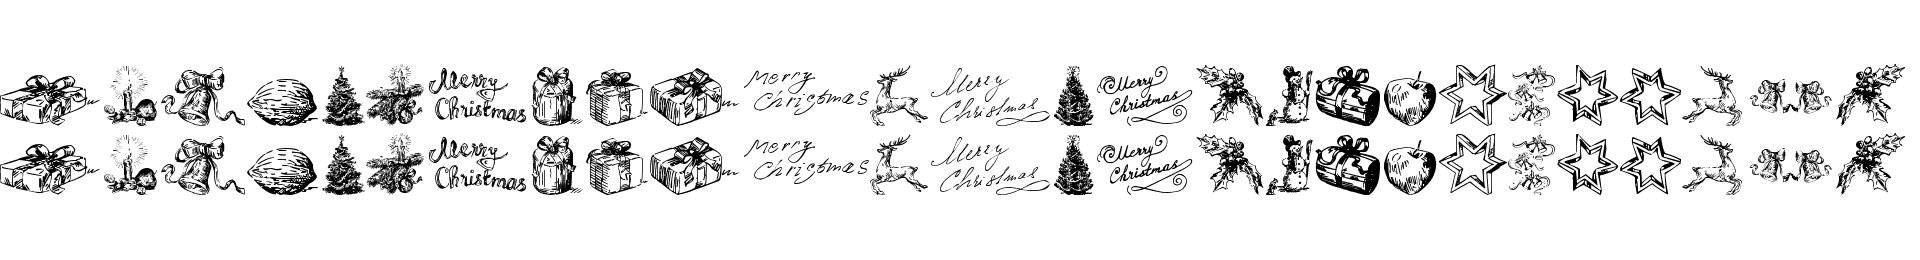 Christmas Nativity TFB